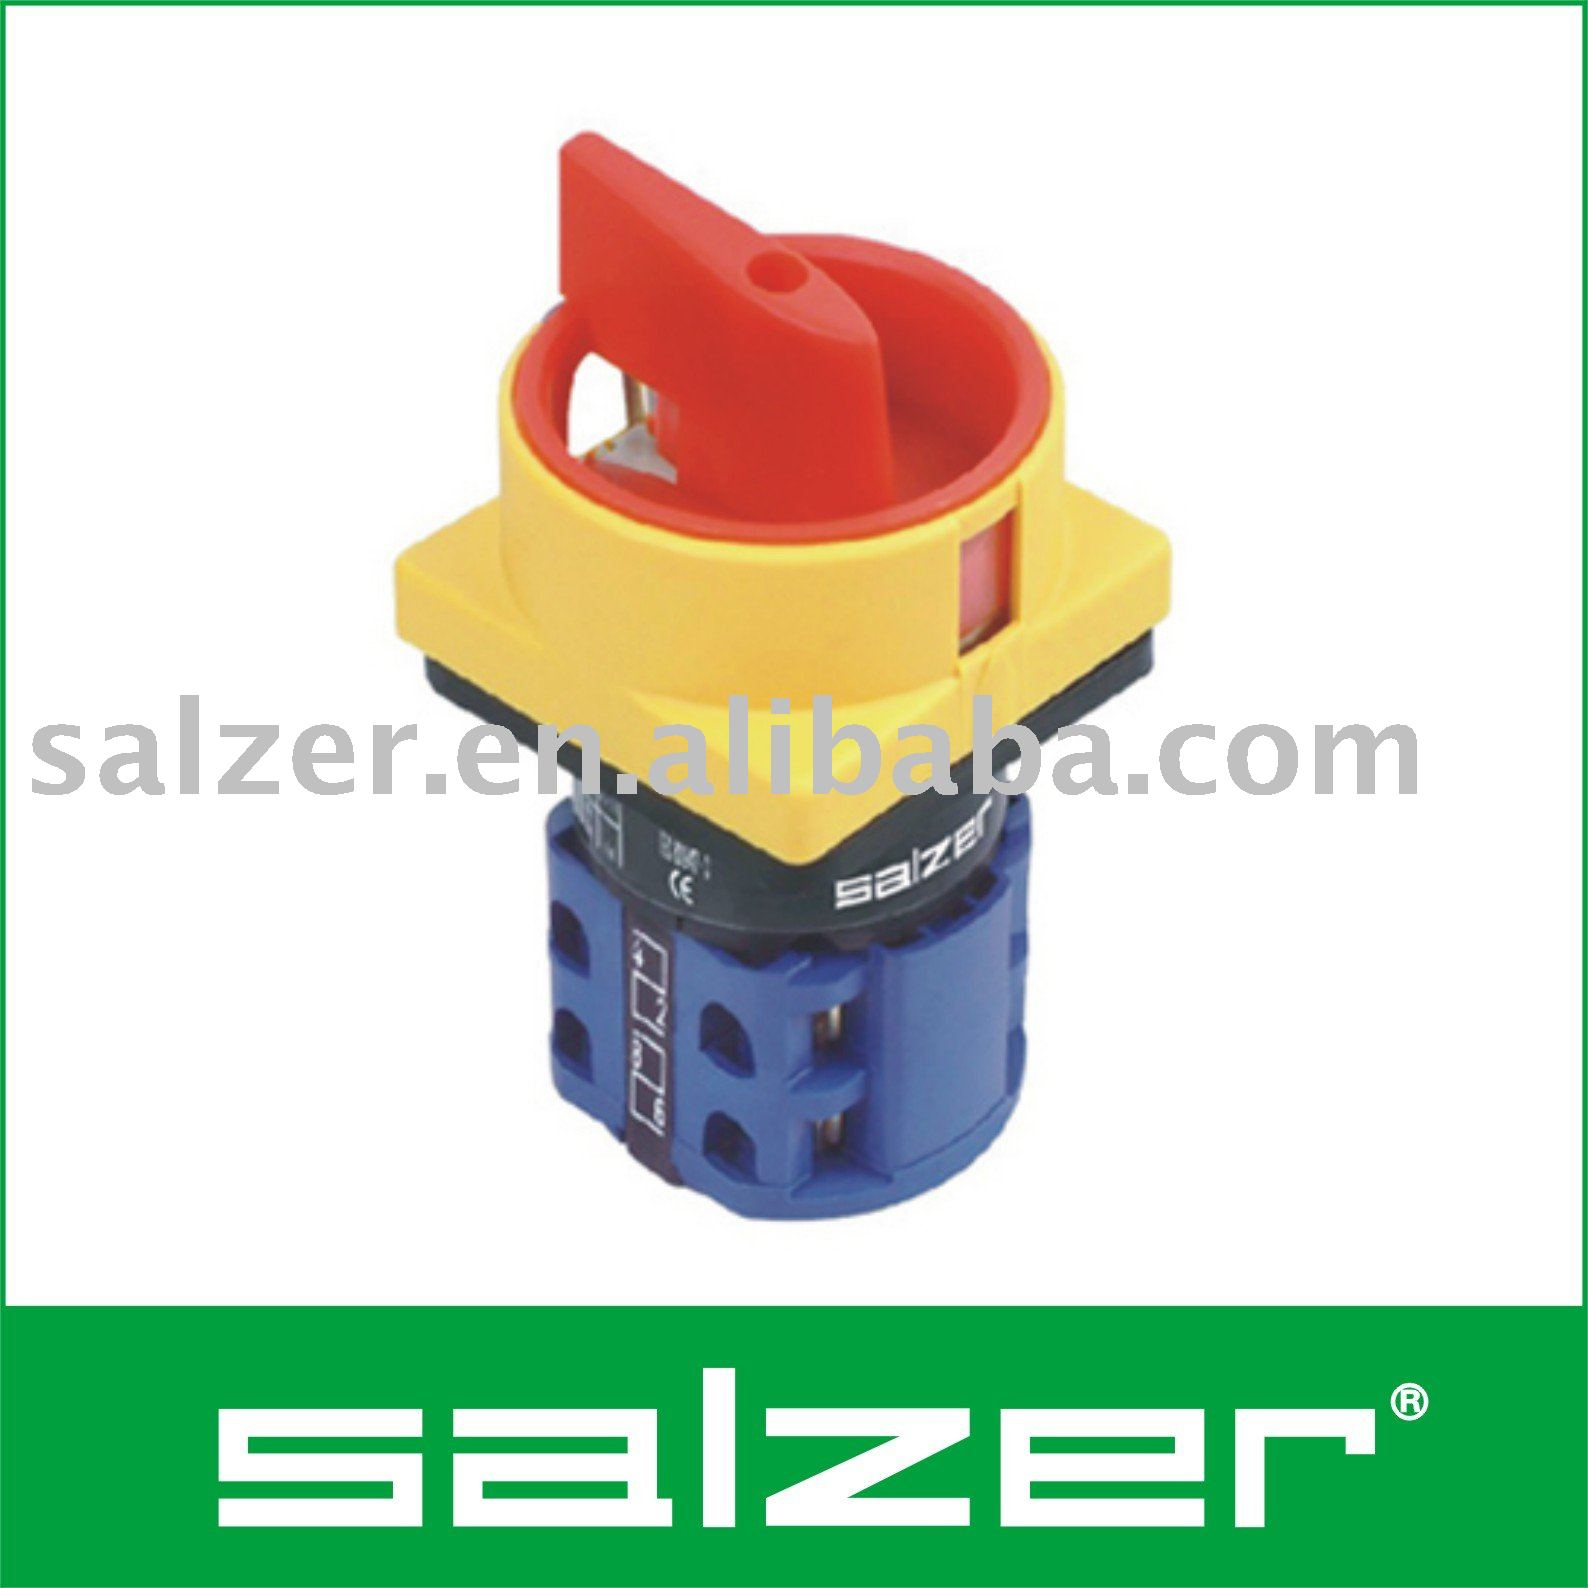 hight resolution of salzer ac isolator switch off on tuv salzer ac isolator switch off on salzer switch wiring diagram 28 wiring